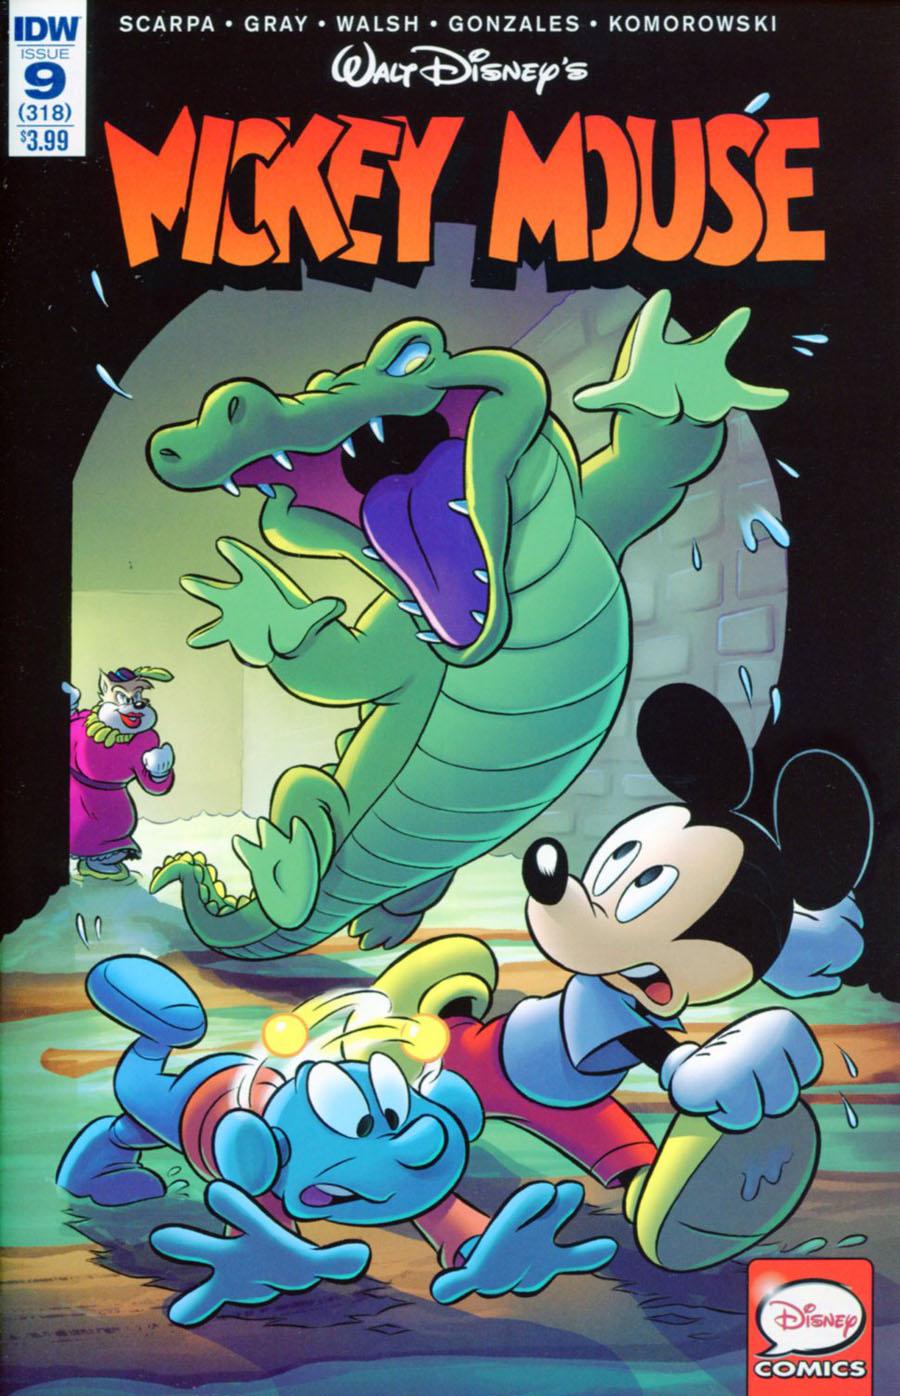 Mickey Mouse Vol 2 #9 Cover A Regular Henrieke Goorhuis Cover